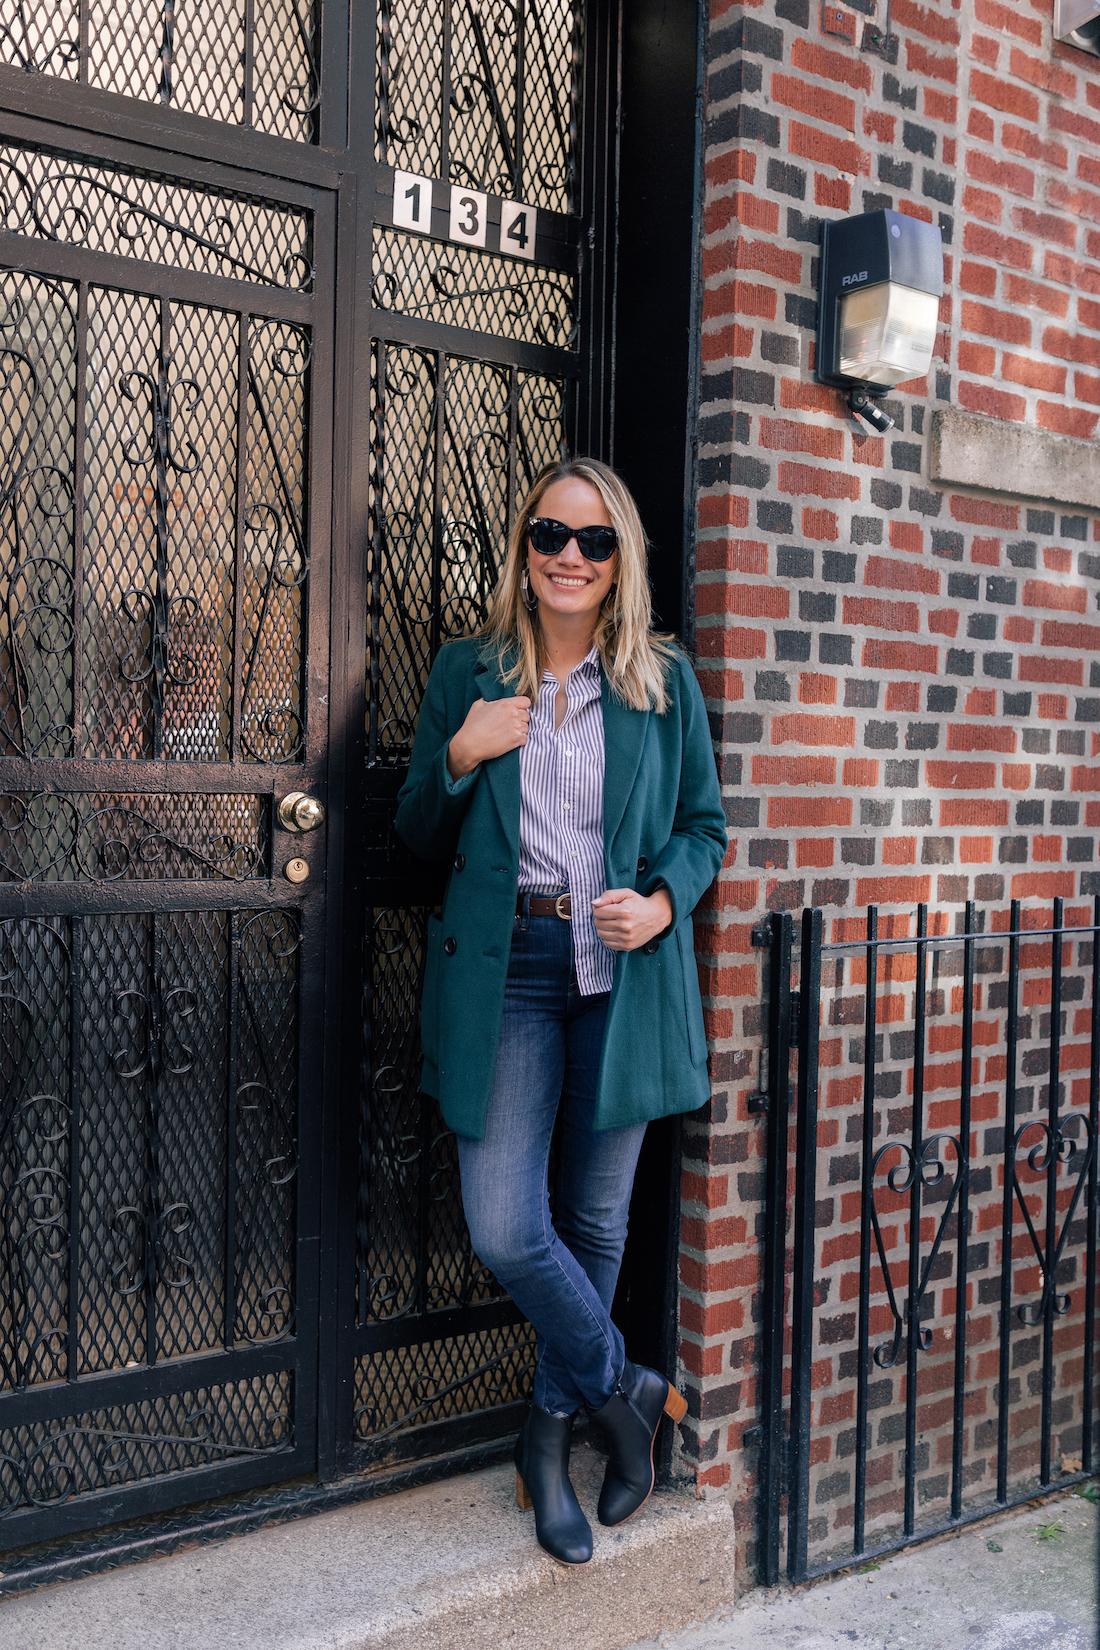 Madewell Coat// Frank & Eileen Classic Button Down Shirt // Good American Jeans // Soludos Boots // Polaroid Sunglasses // J.Crew Belt // Gucci Bag